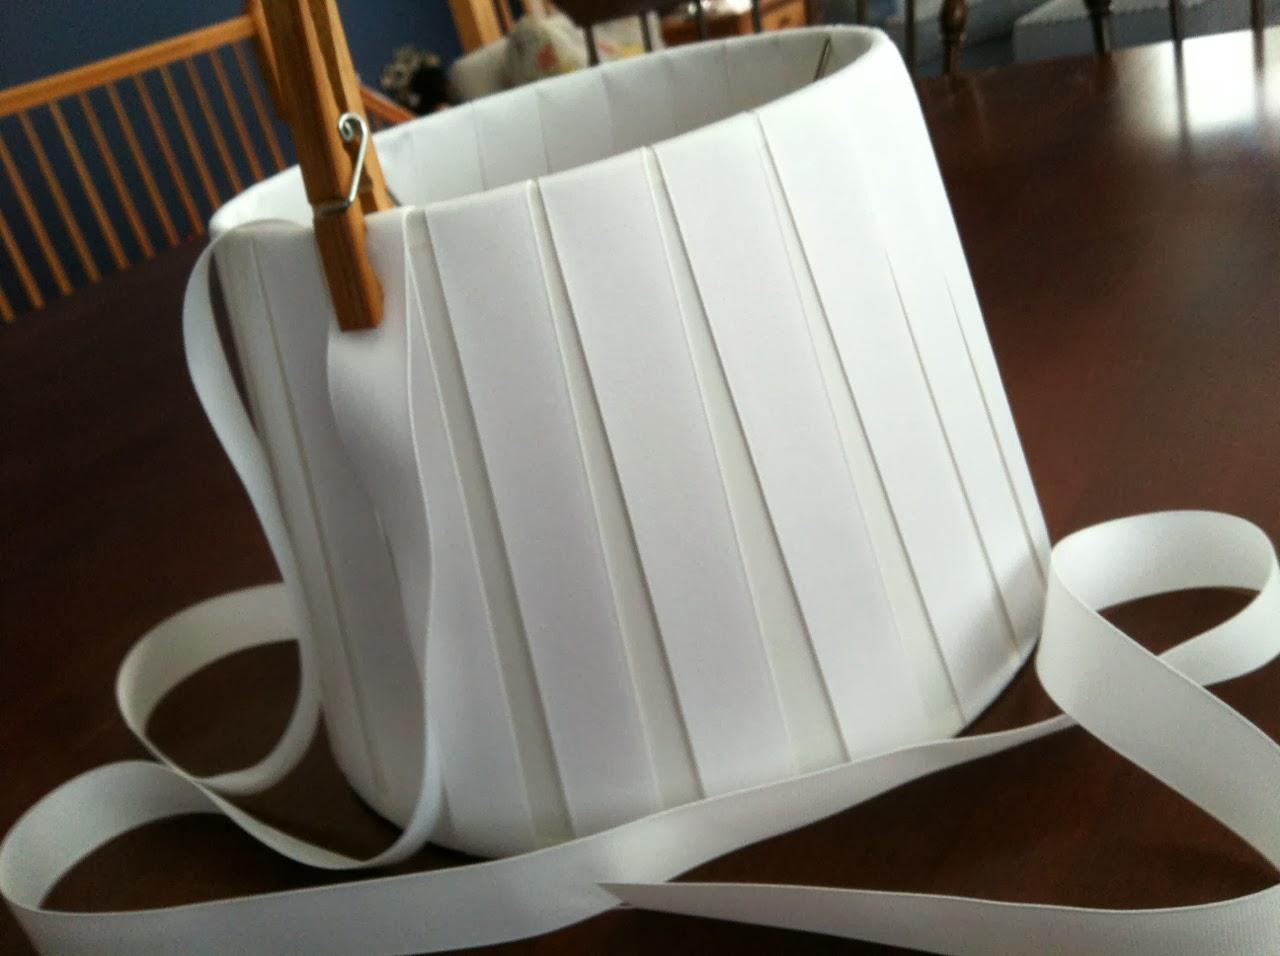 DIY Lampshade - DIY Craft Projects